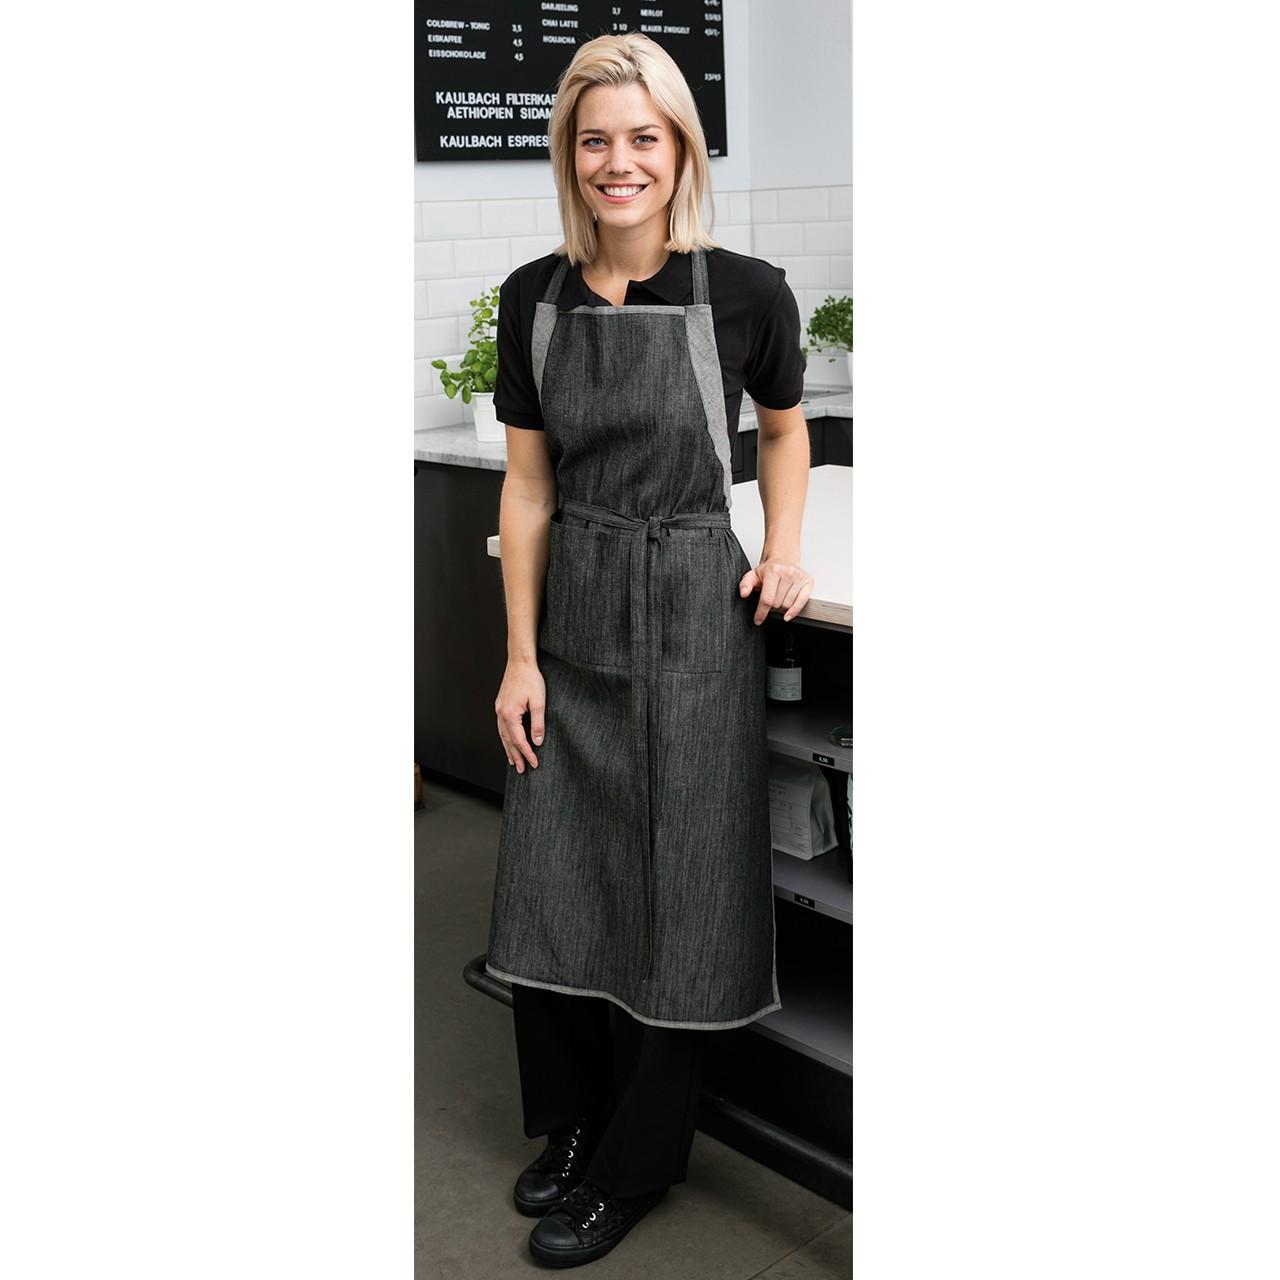 Latzschürze im Jeanslook 2-farbig Exner® | bedrucken, besticken, bedrucken lassen, besticken lassen, mit Logo |